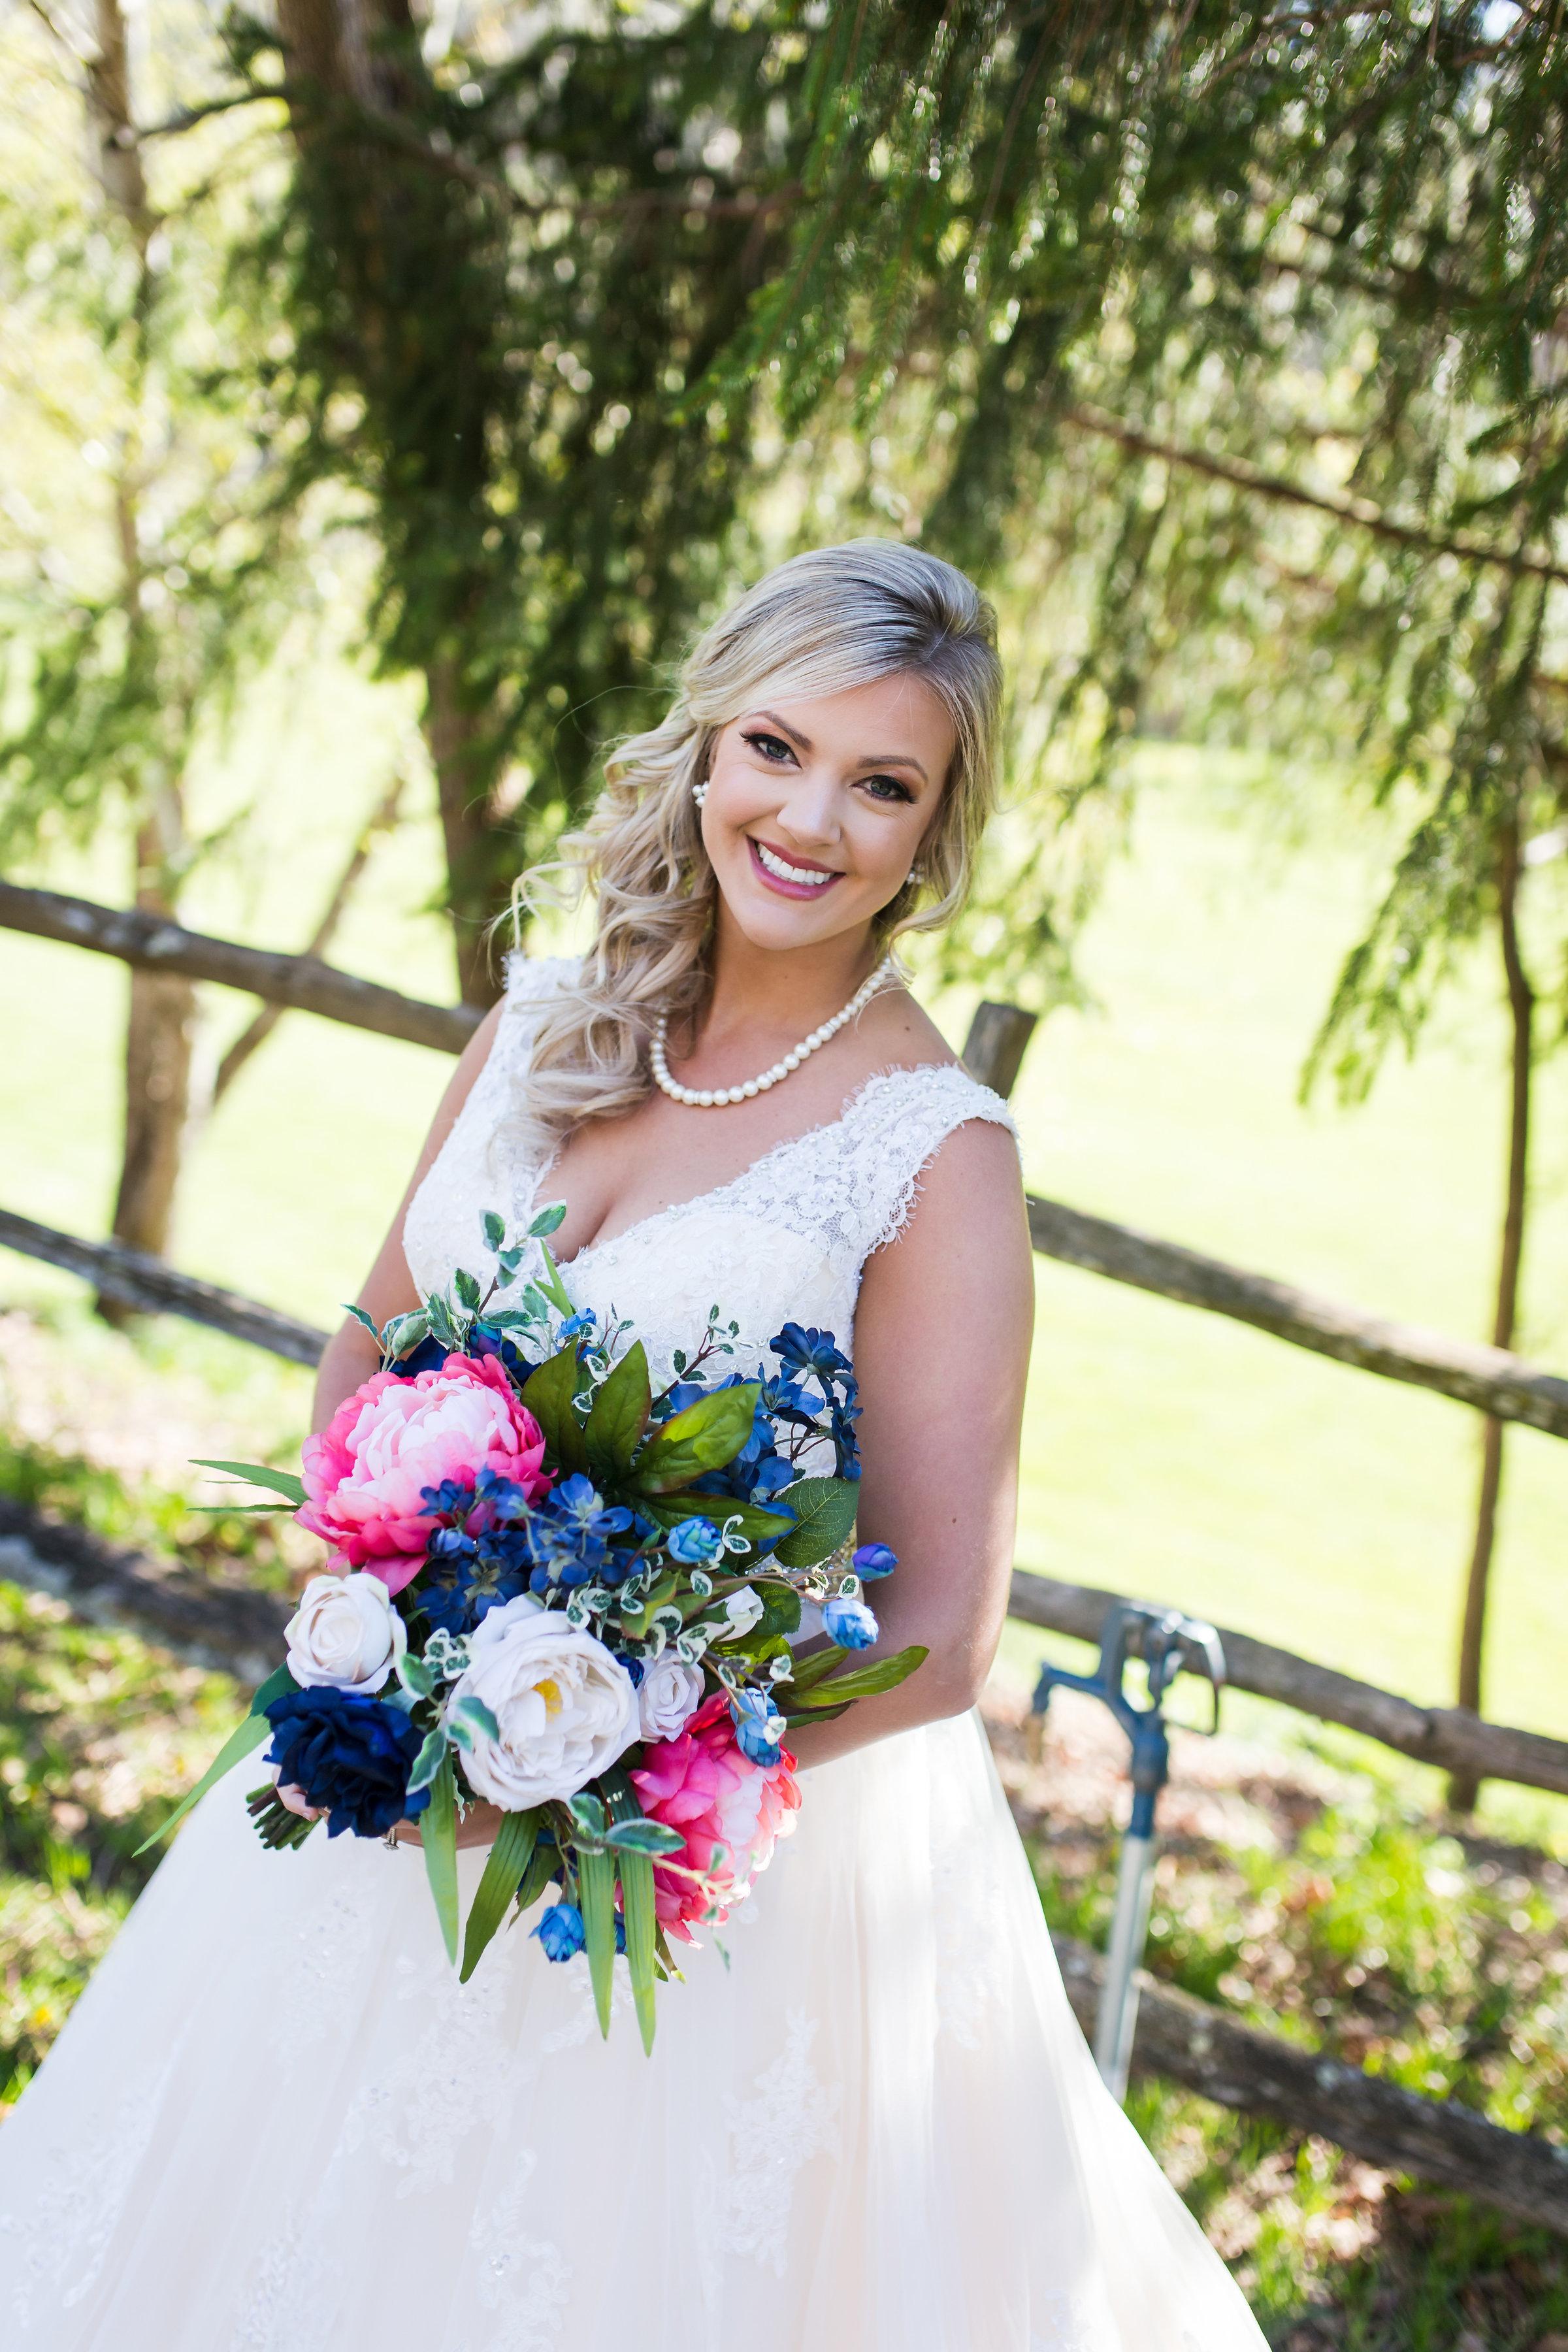 Honeysuckle-Hill-Asheville-Wedding-Venue-Ann-Cordell-Bridal-2.JPG